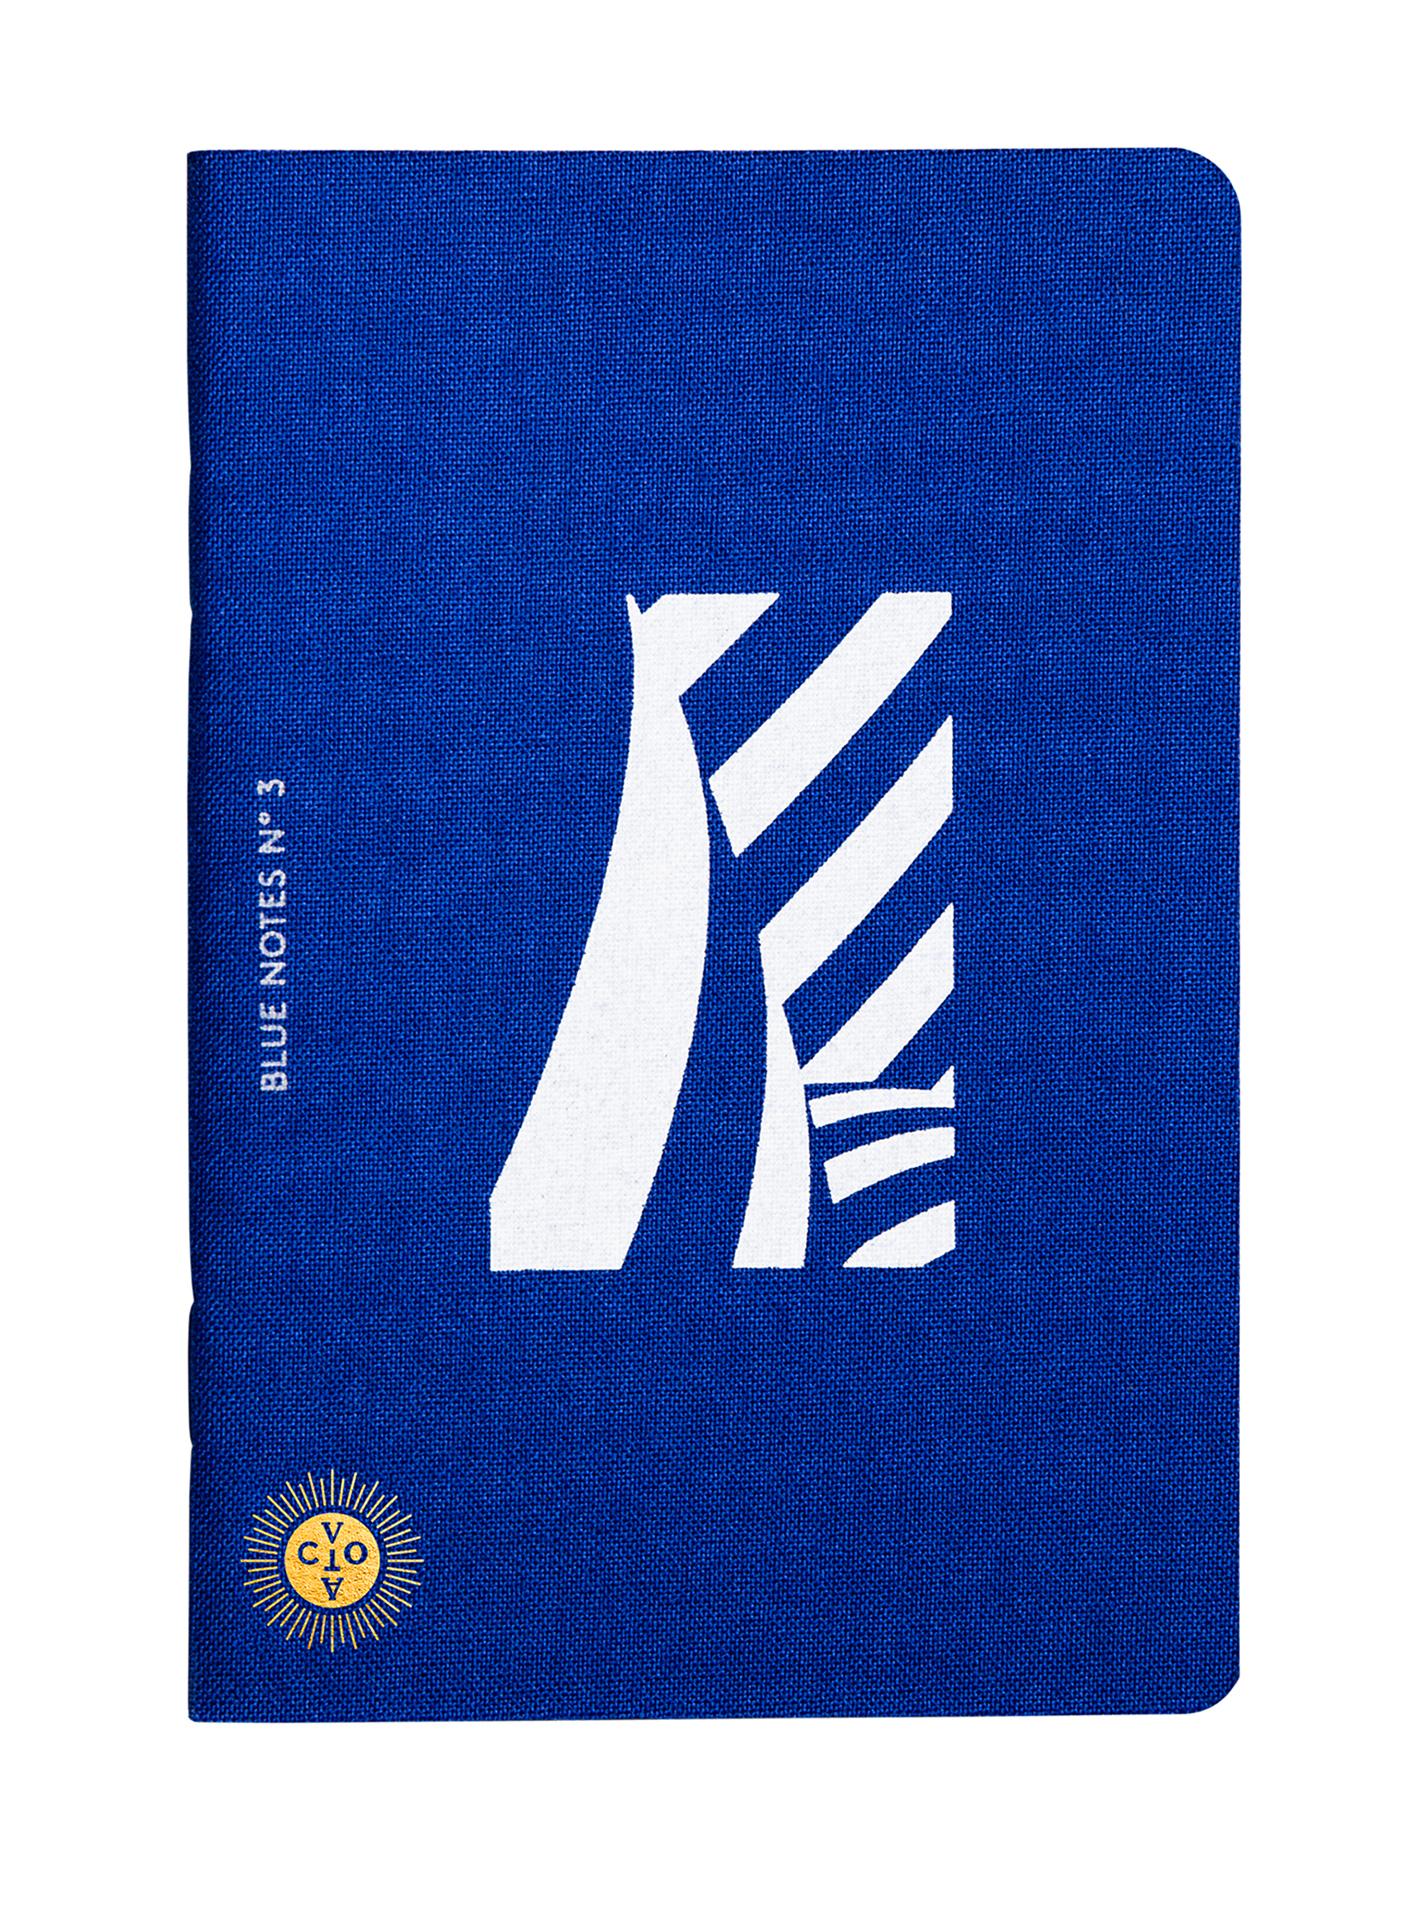 Passport Blue Notes Nº 3